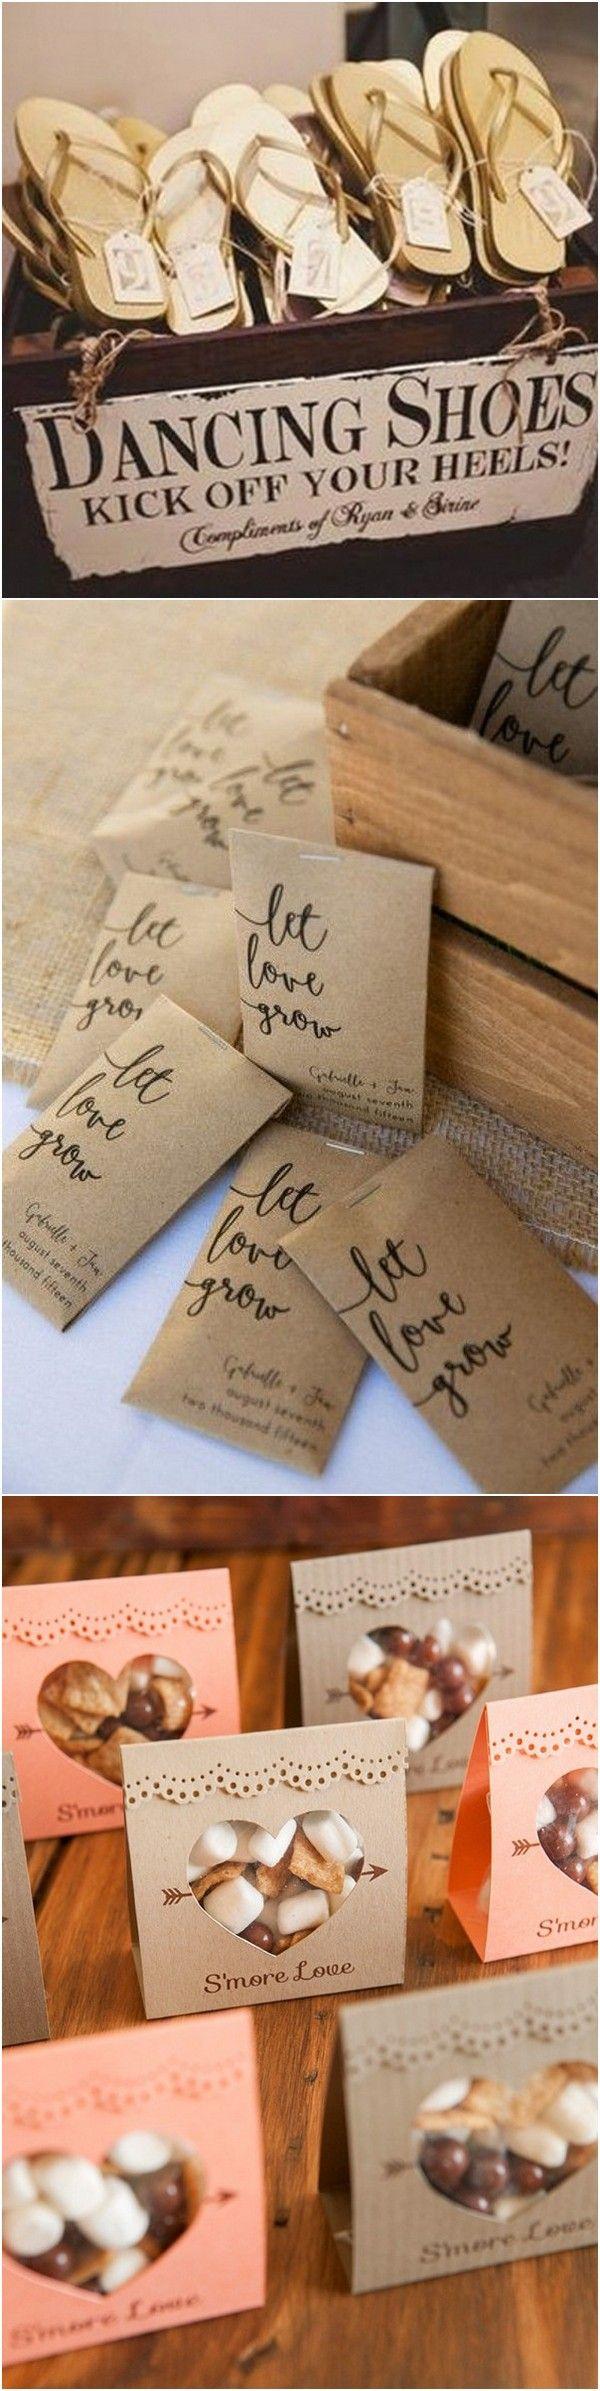 Top  Unique Wedding Favor Ideas Your Guests Love  Creative